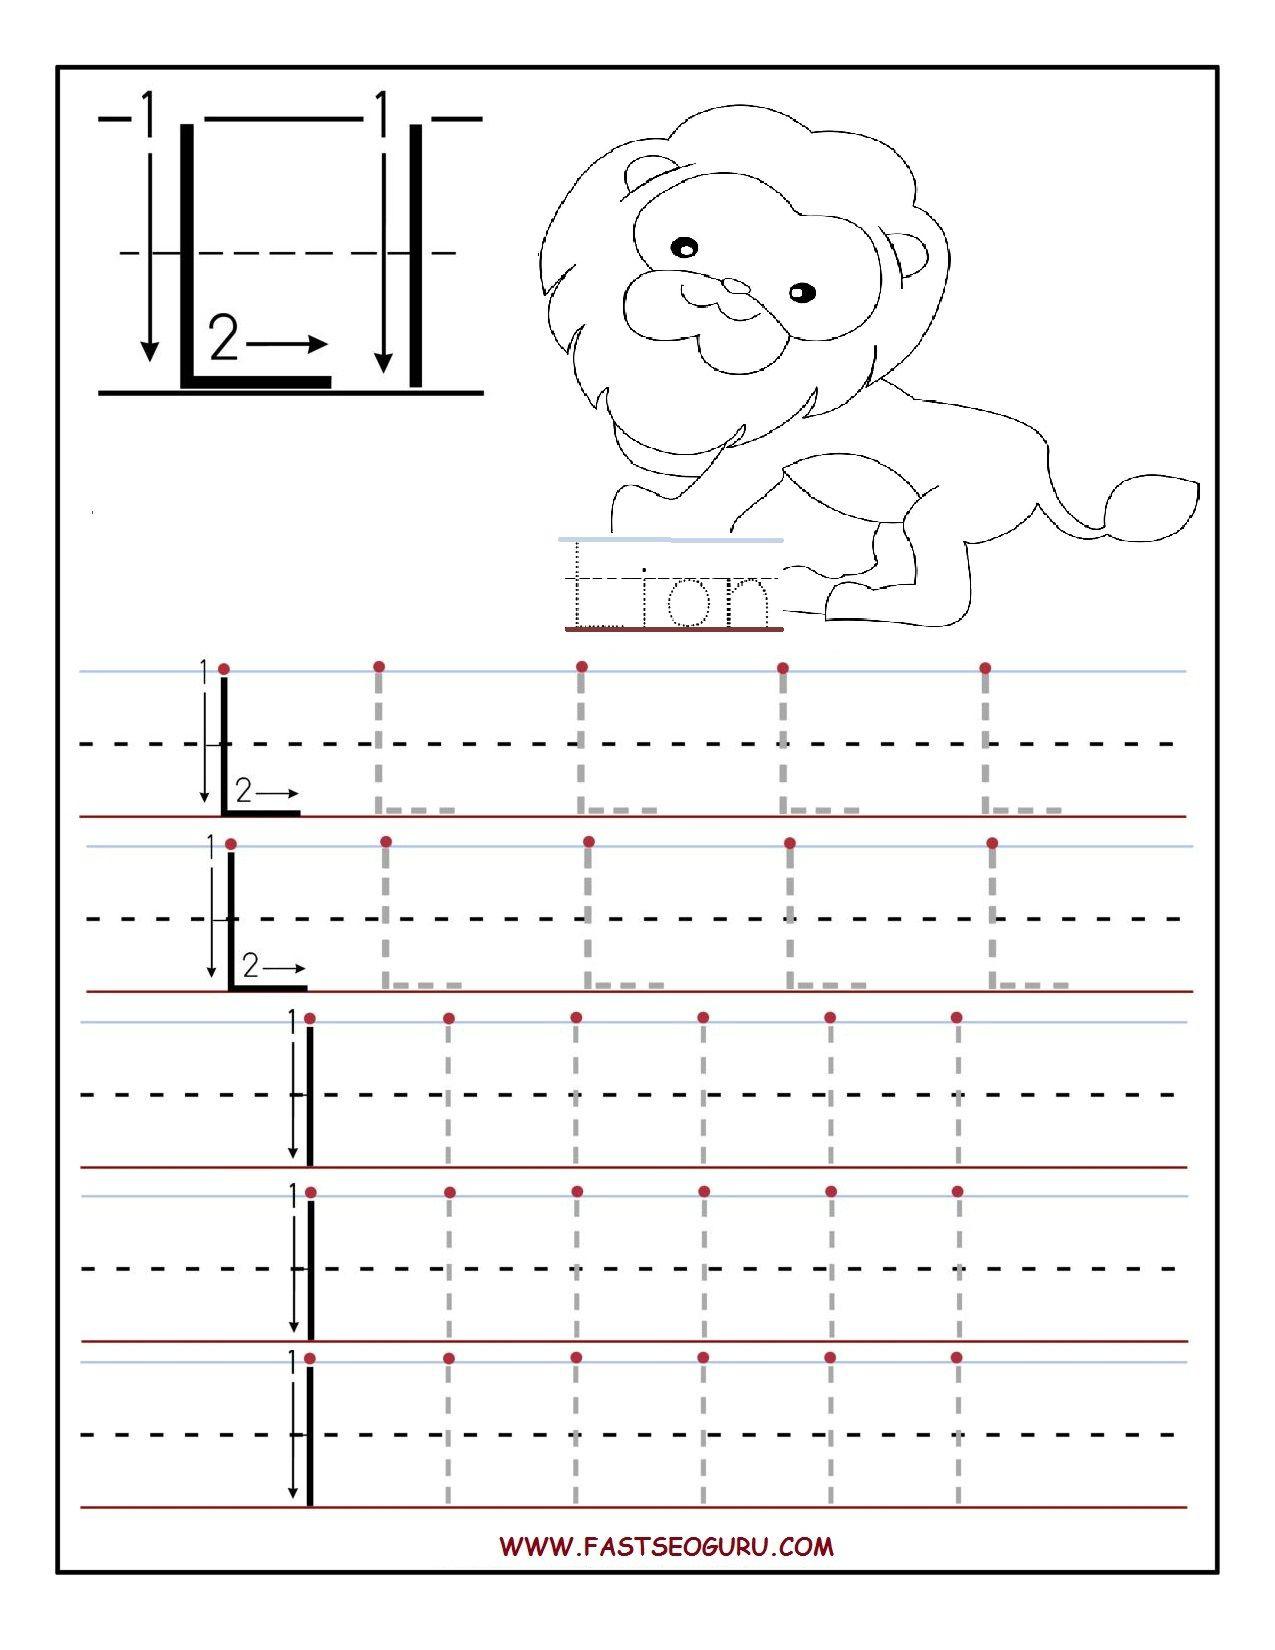 Pinvilfran Gason On Decor | Preschool Worksheets intended for Letter Ll Worksheets